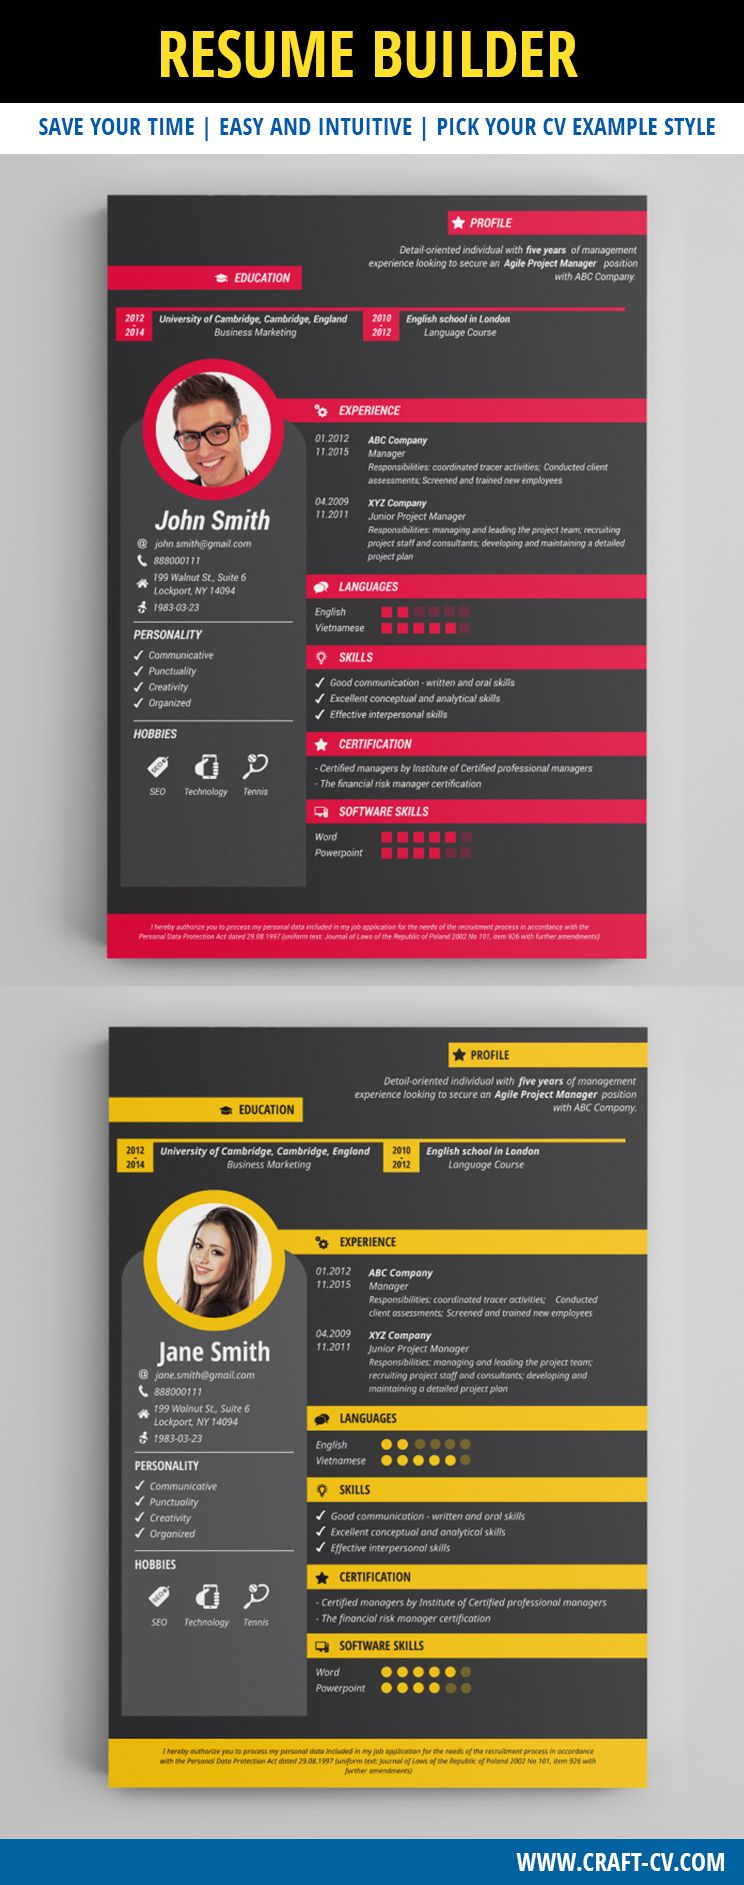 Creative CV Examples Resume CV Builder